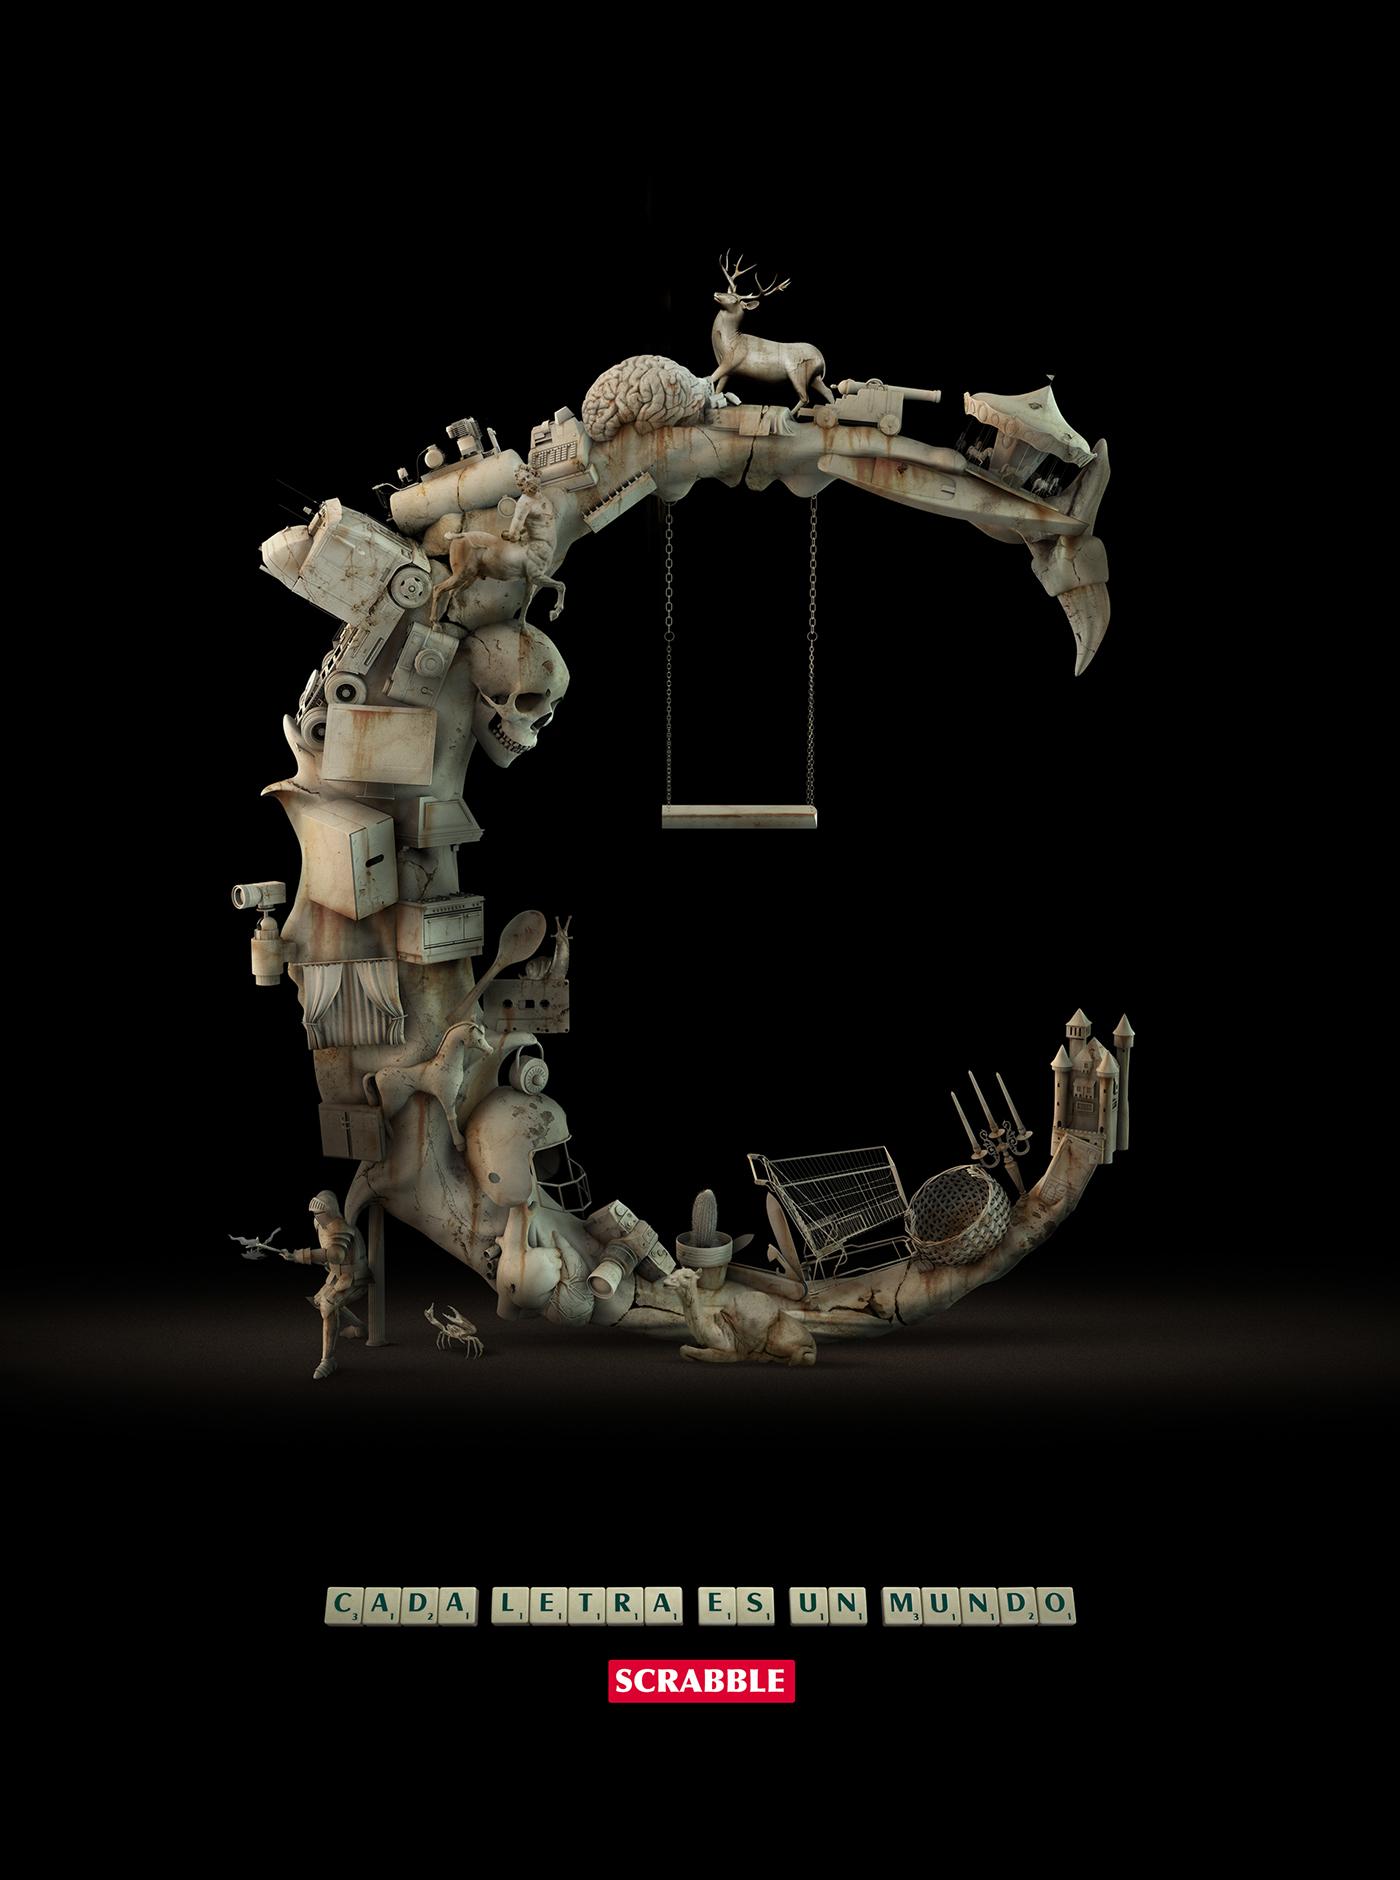 Sergio Duarte DDB Chile Scrabble letters 3D art Render design ILLUSTRATION  digital